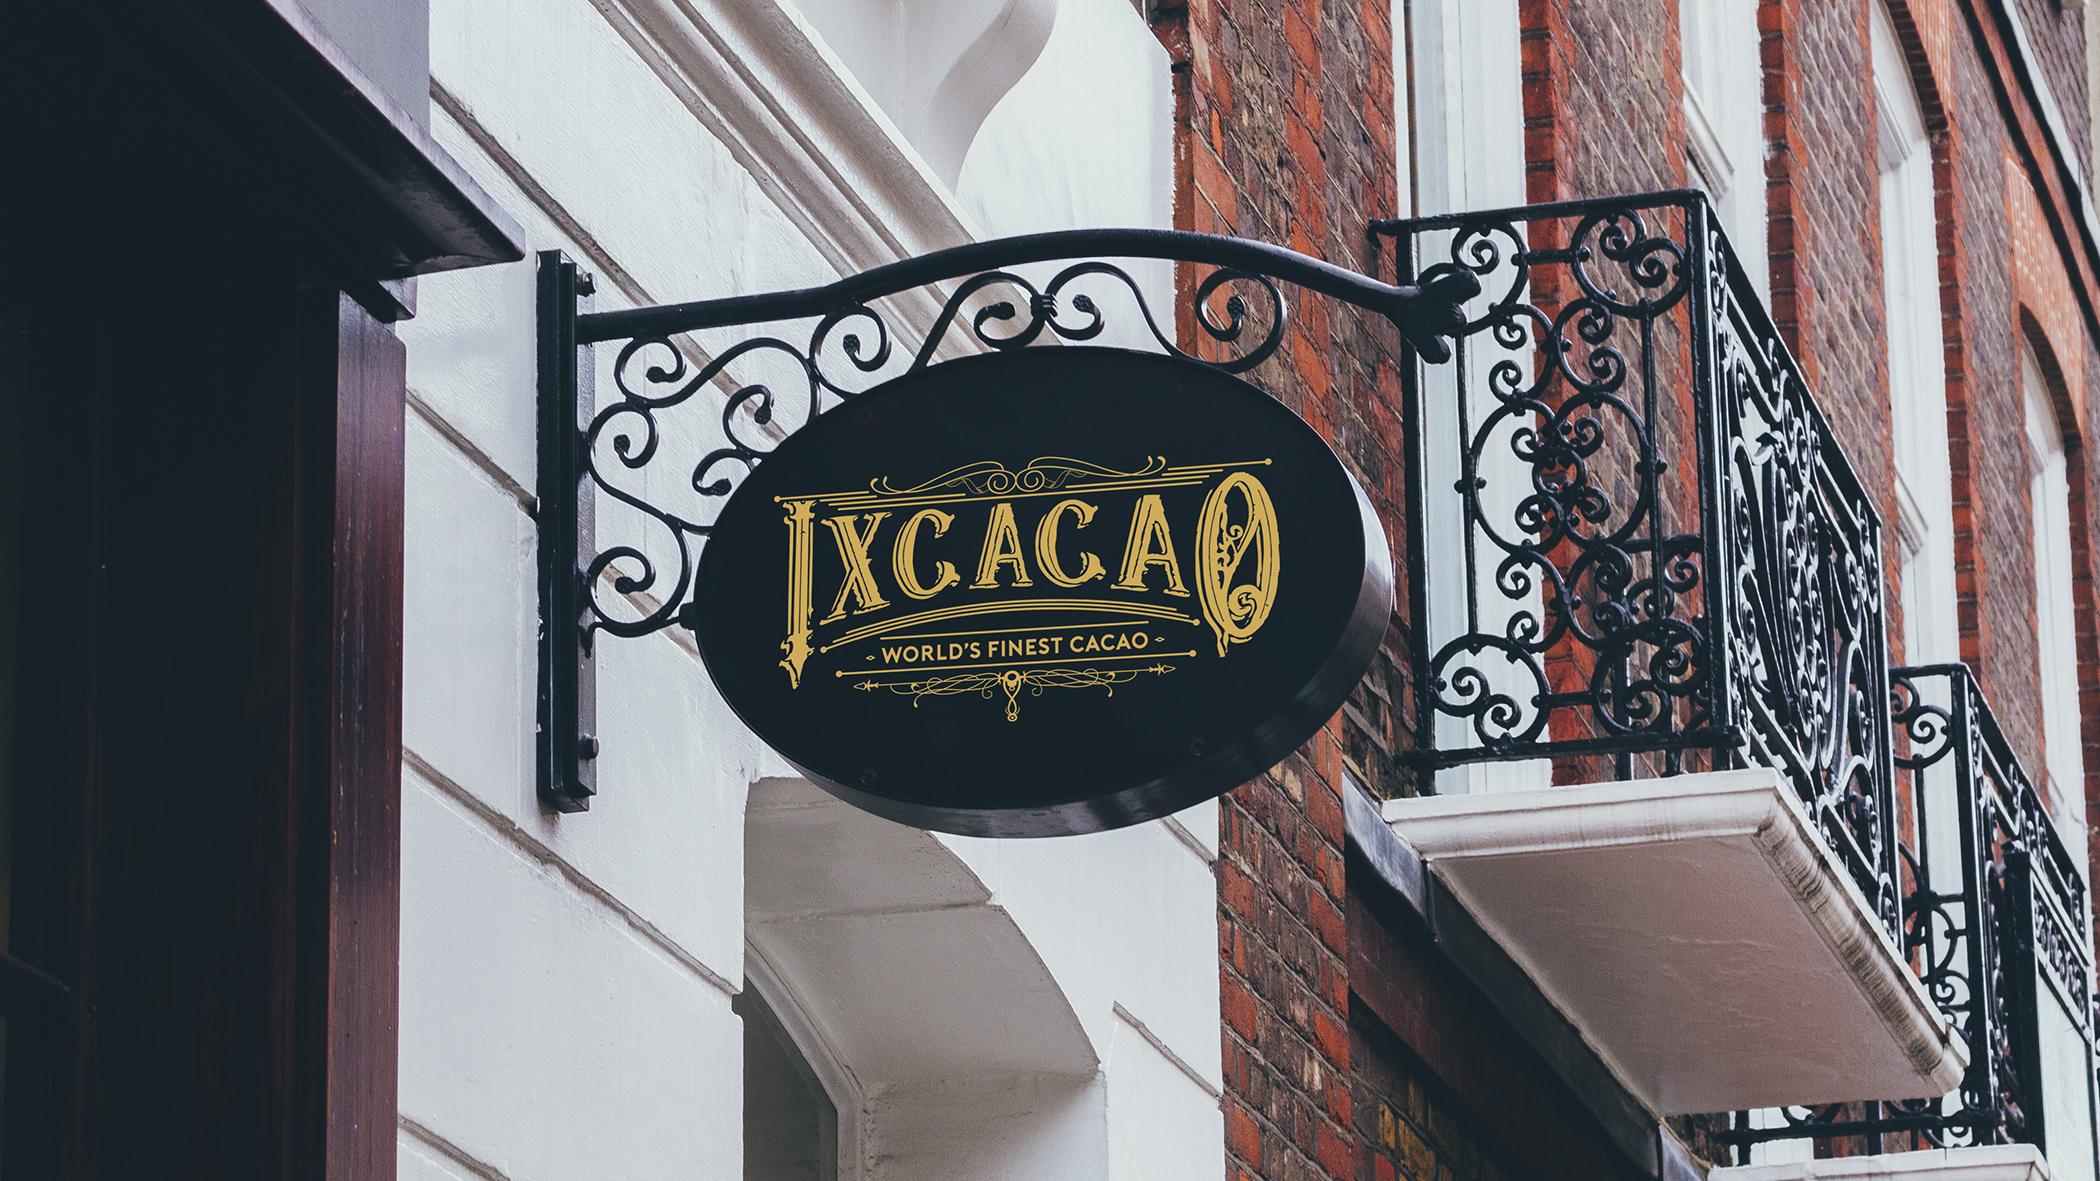 IXCACAO Chocolate Cafe